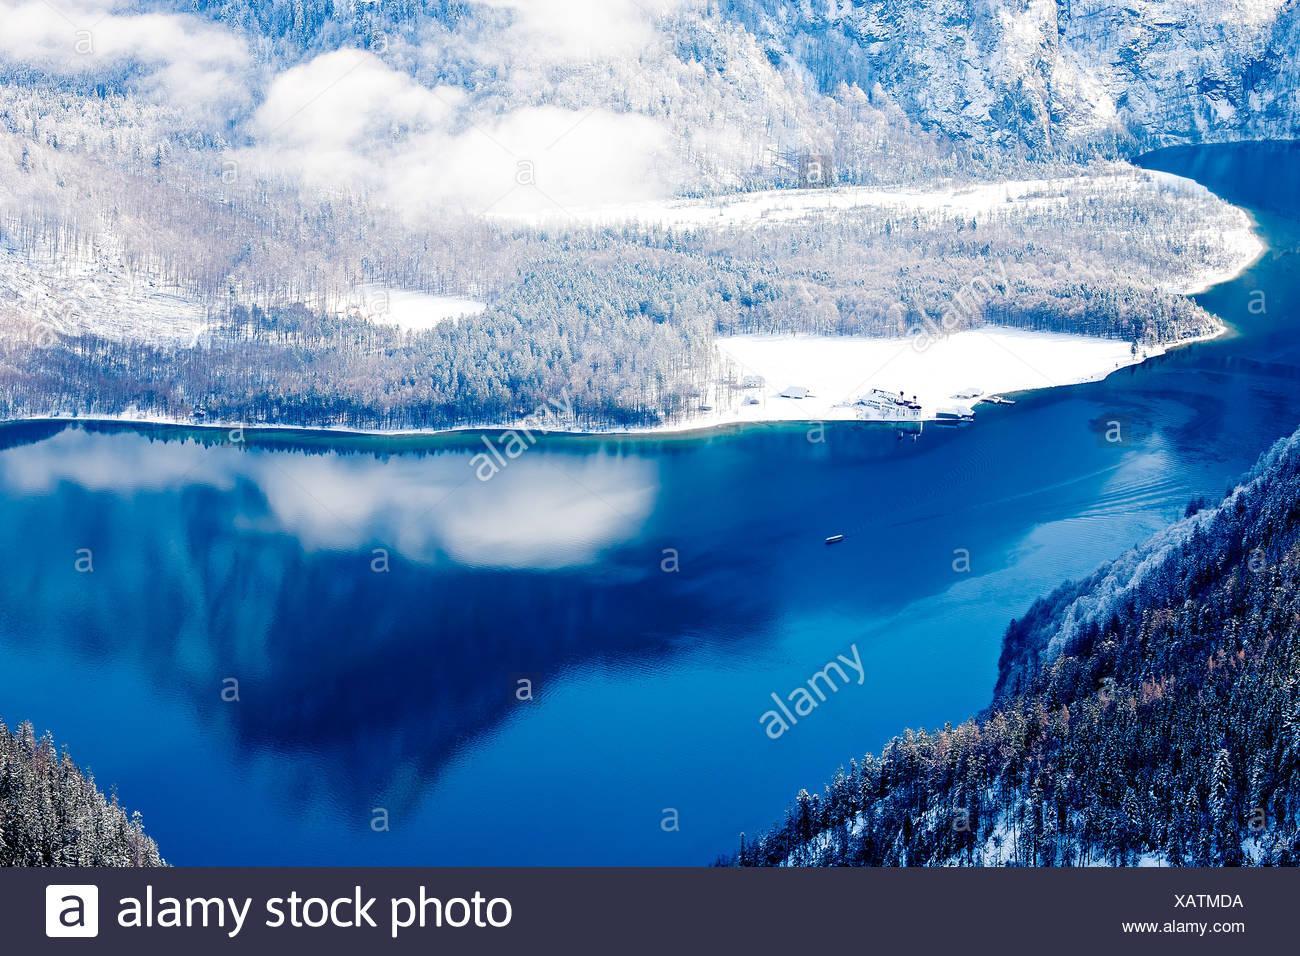 Lake Koenigssee in winter, Alps, Bavaria, Germany, Europe - Stock Image